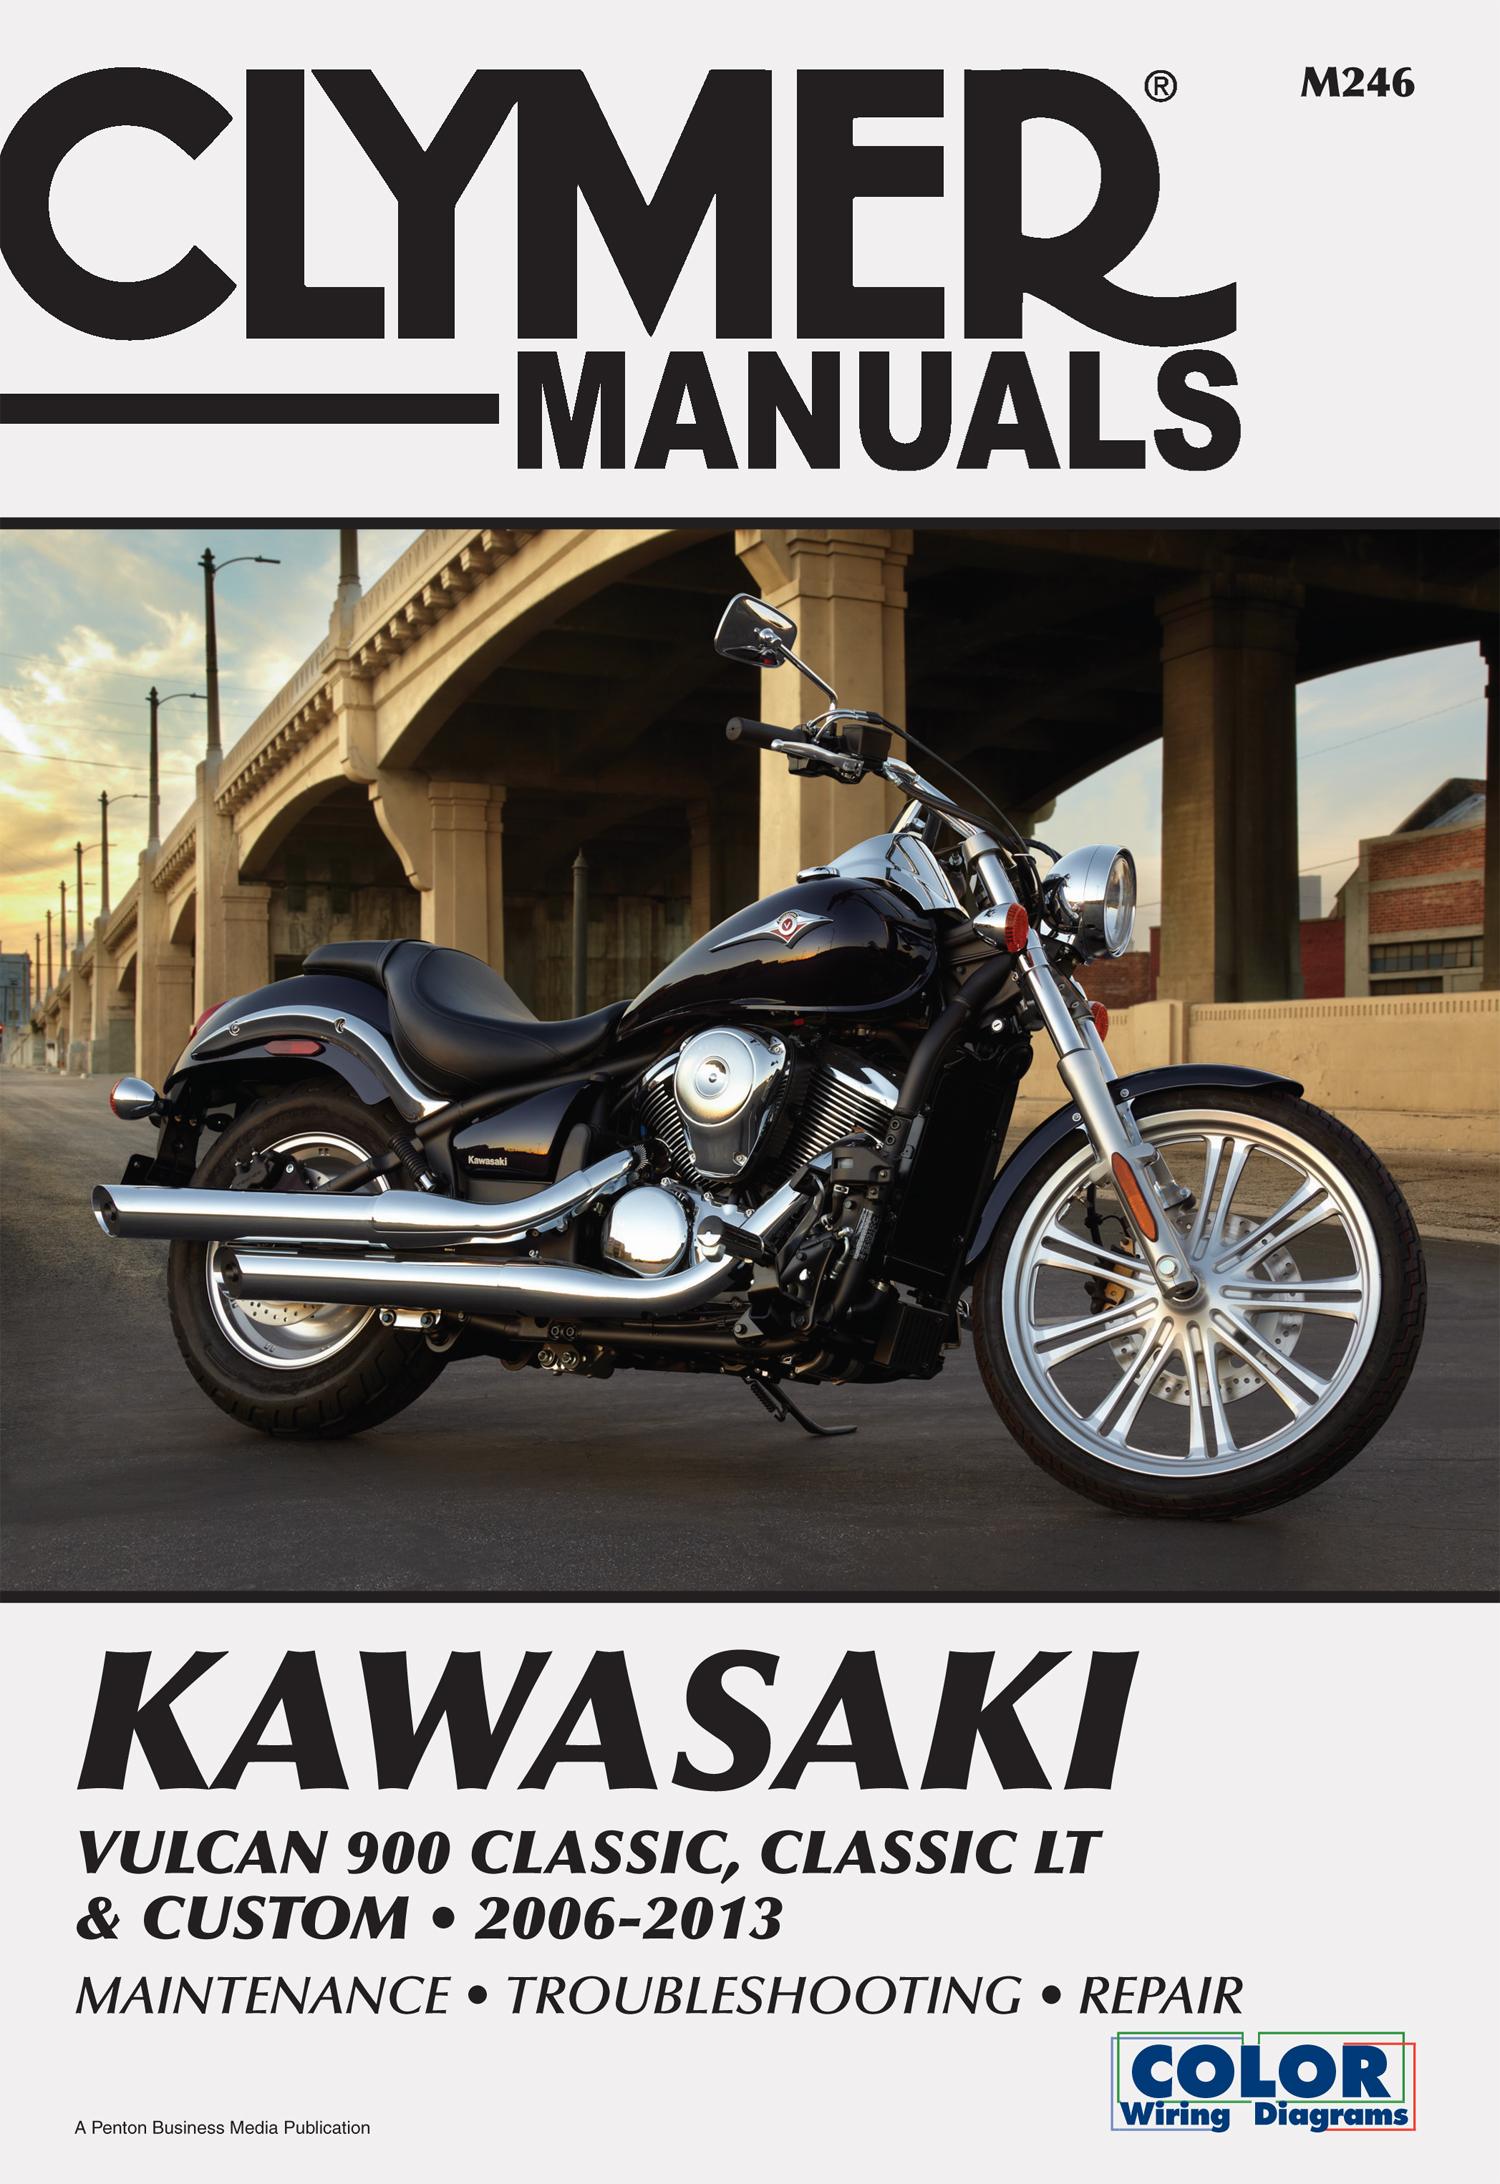 M246 Clymer Manuals Kawasaki Vulcan 900 Manual